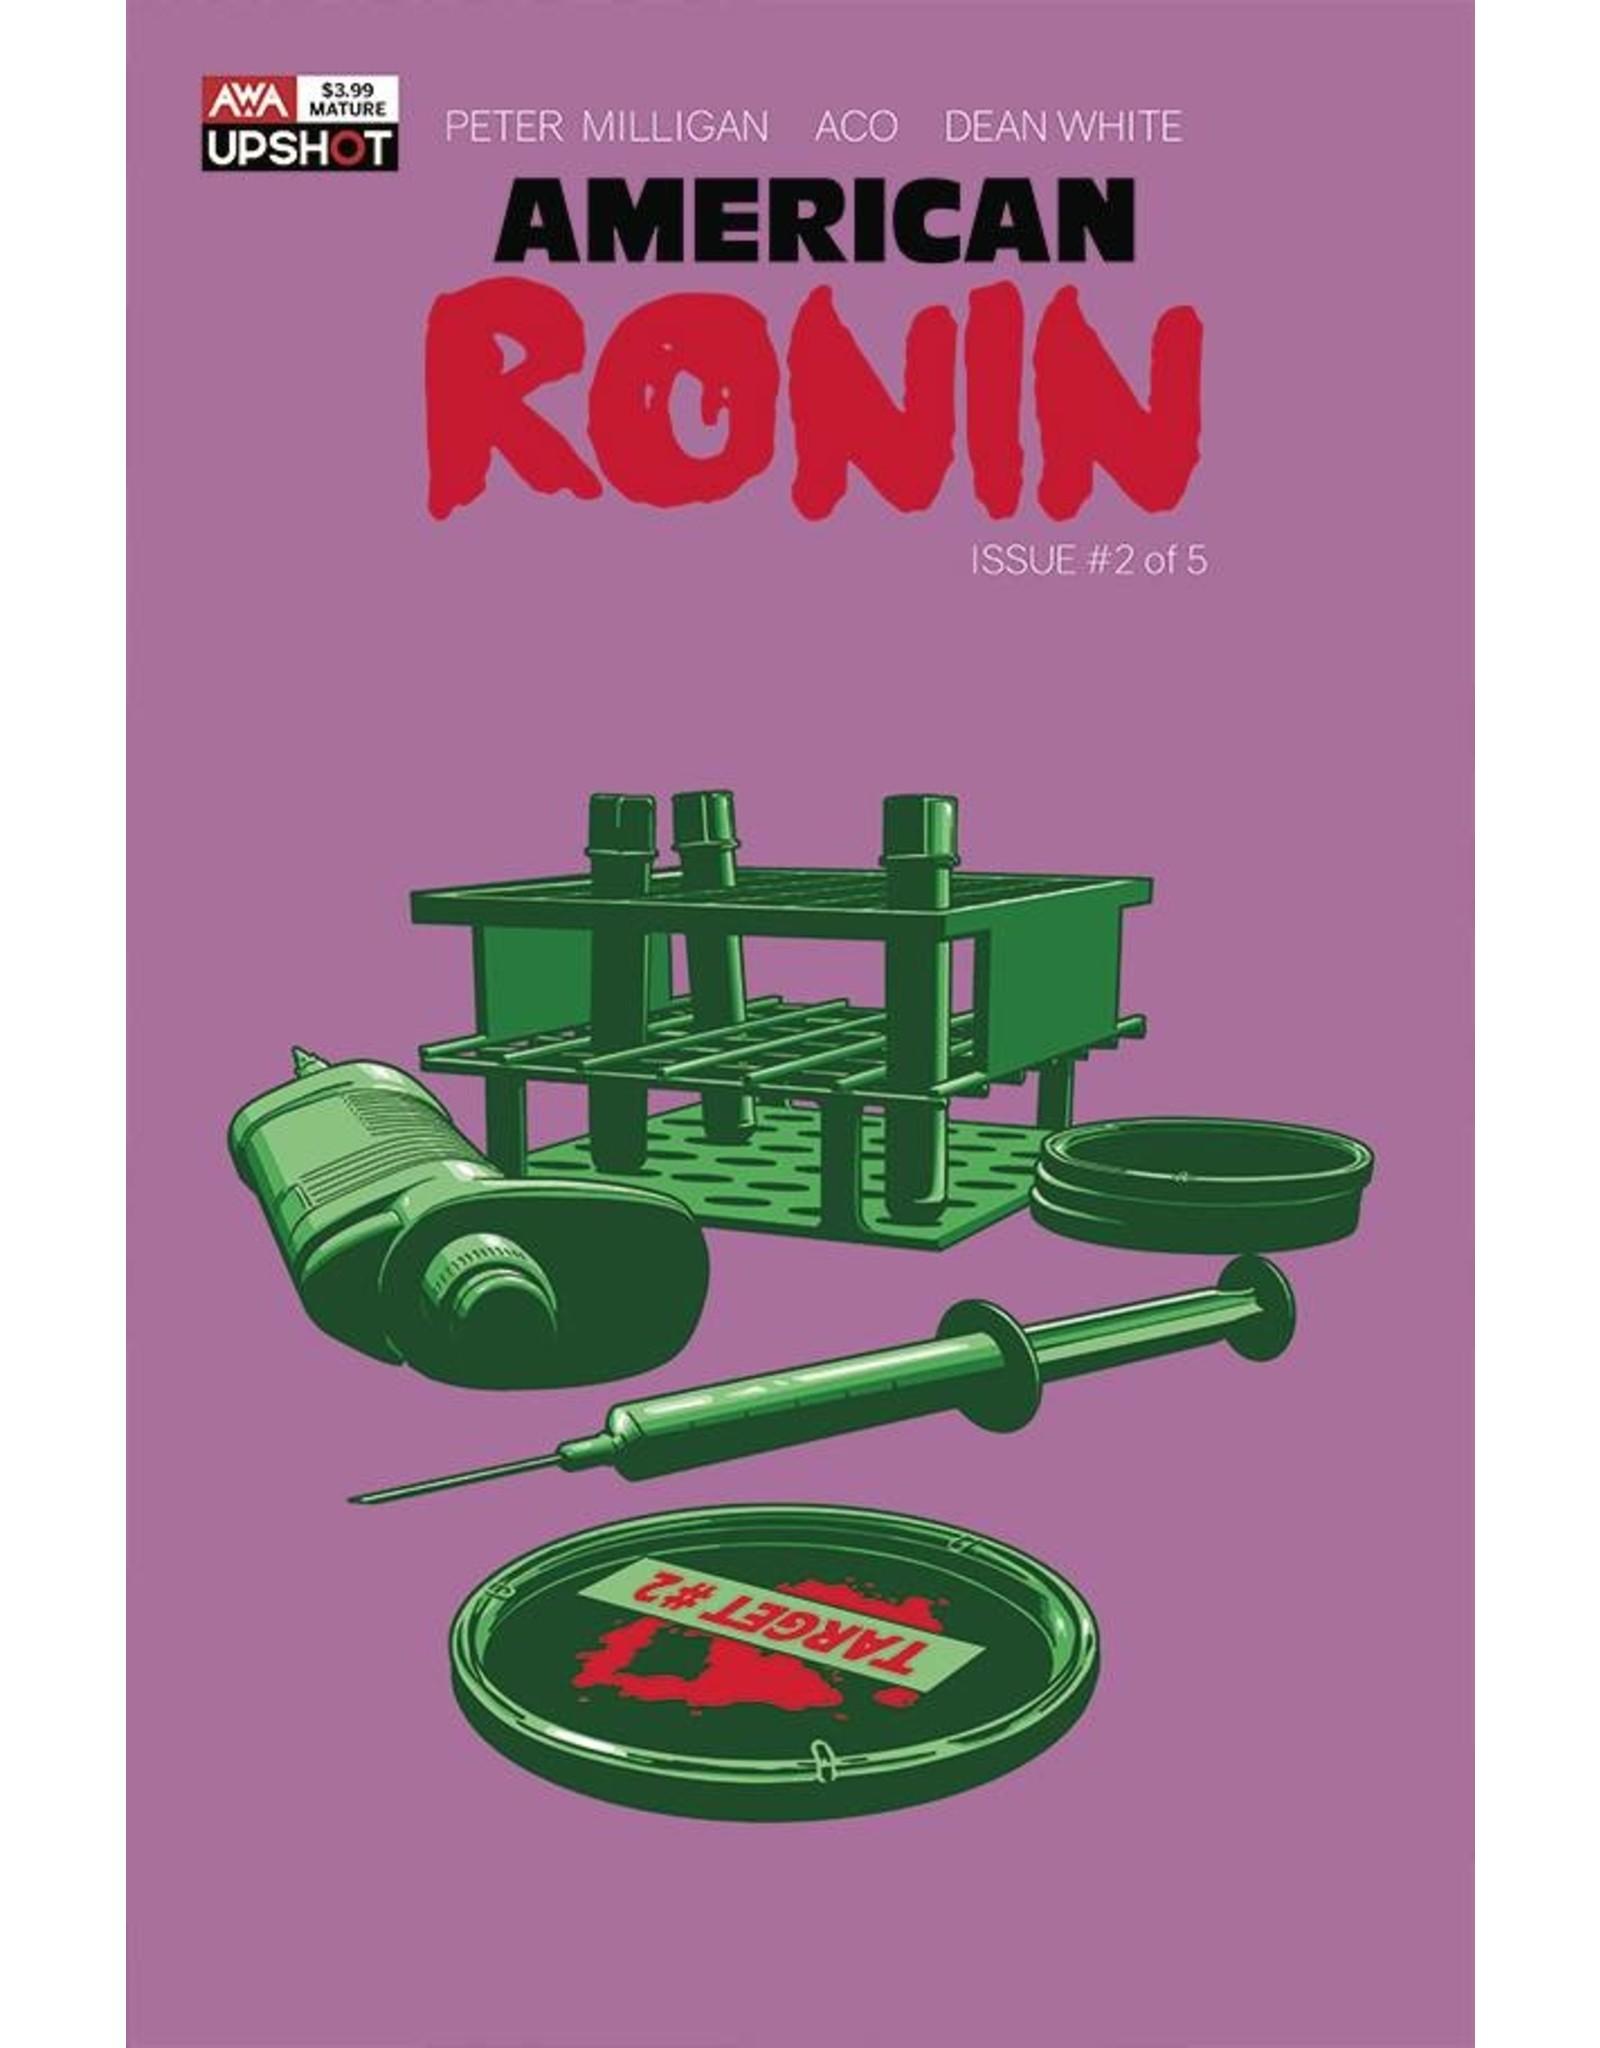 AMERICAN RONIN #2 (OF 5) CVR A ACO